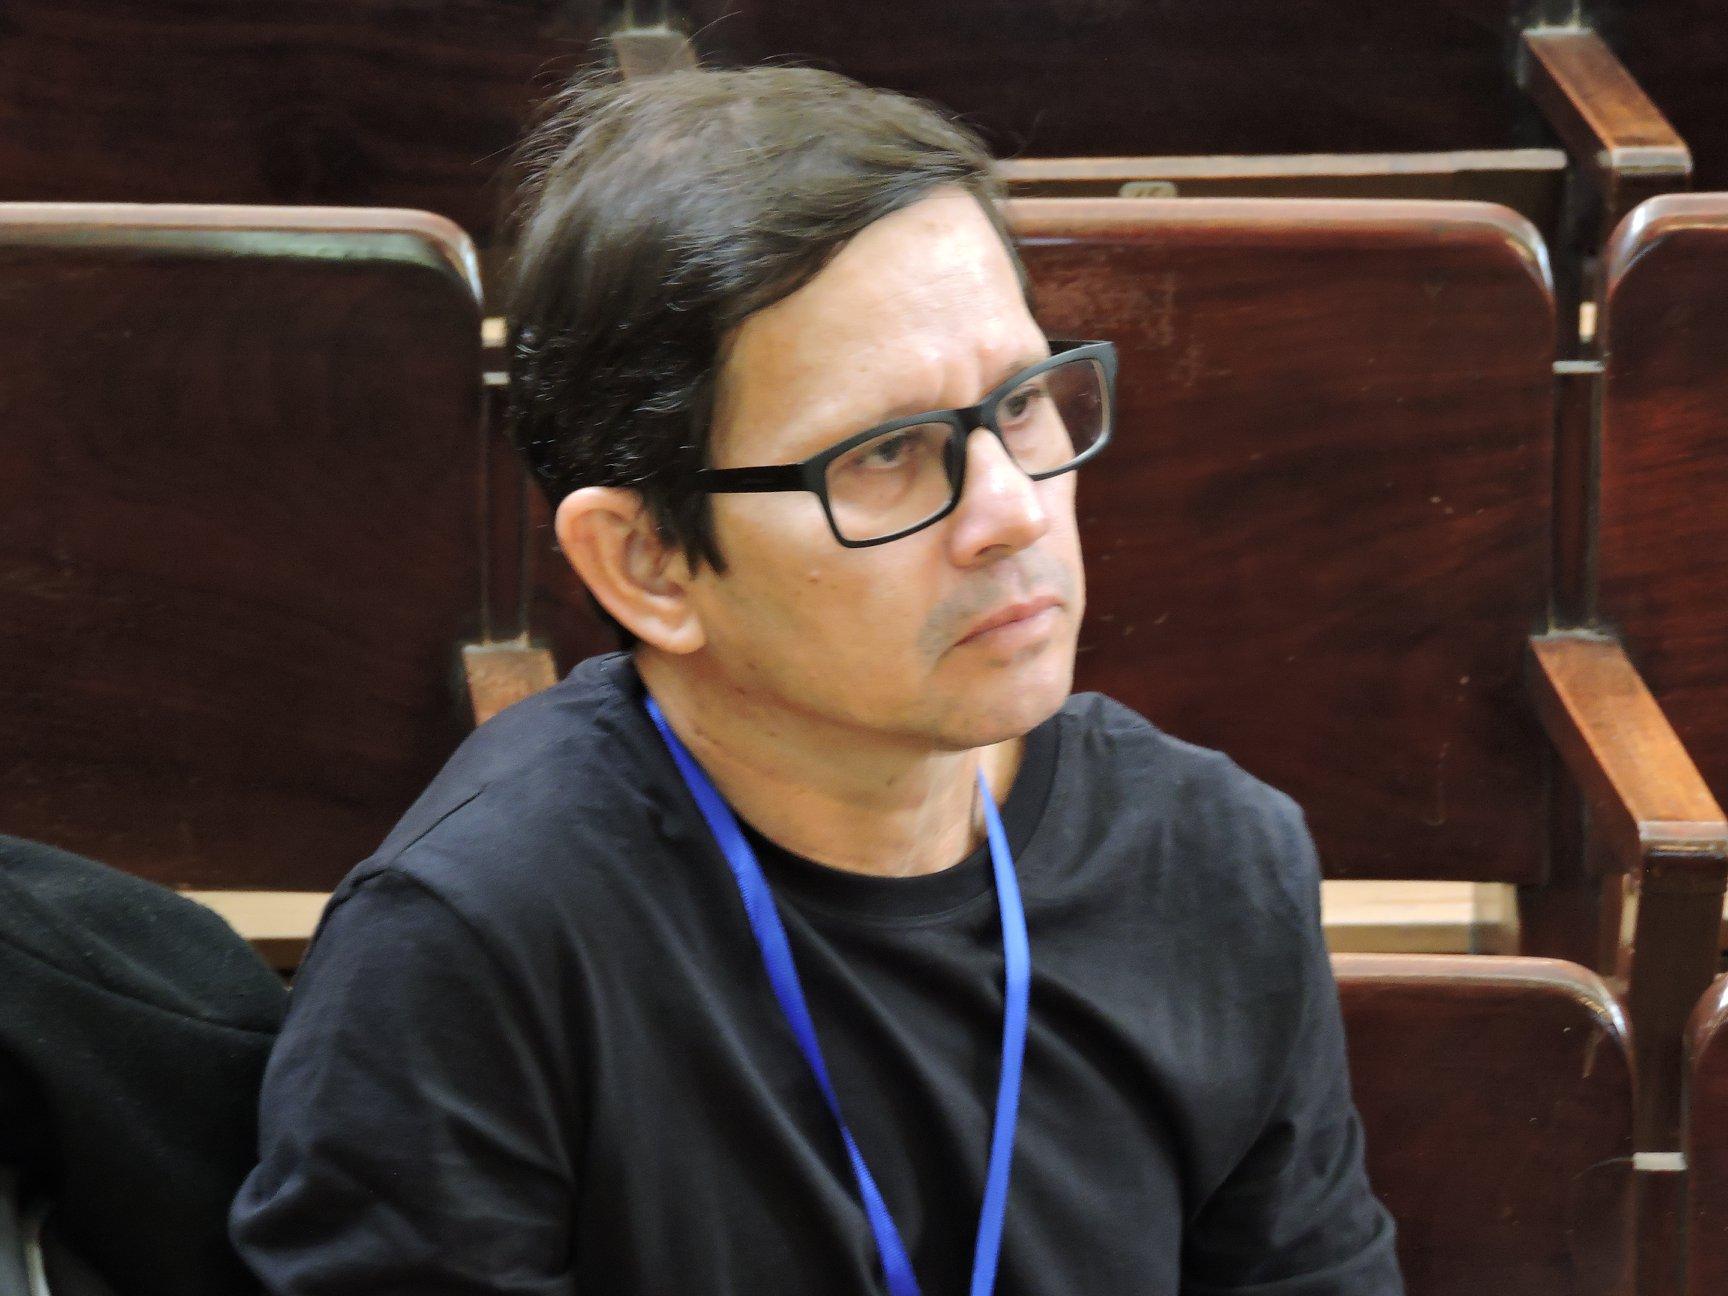 Vancarder Brito Sousa